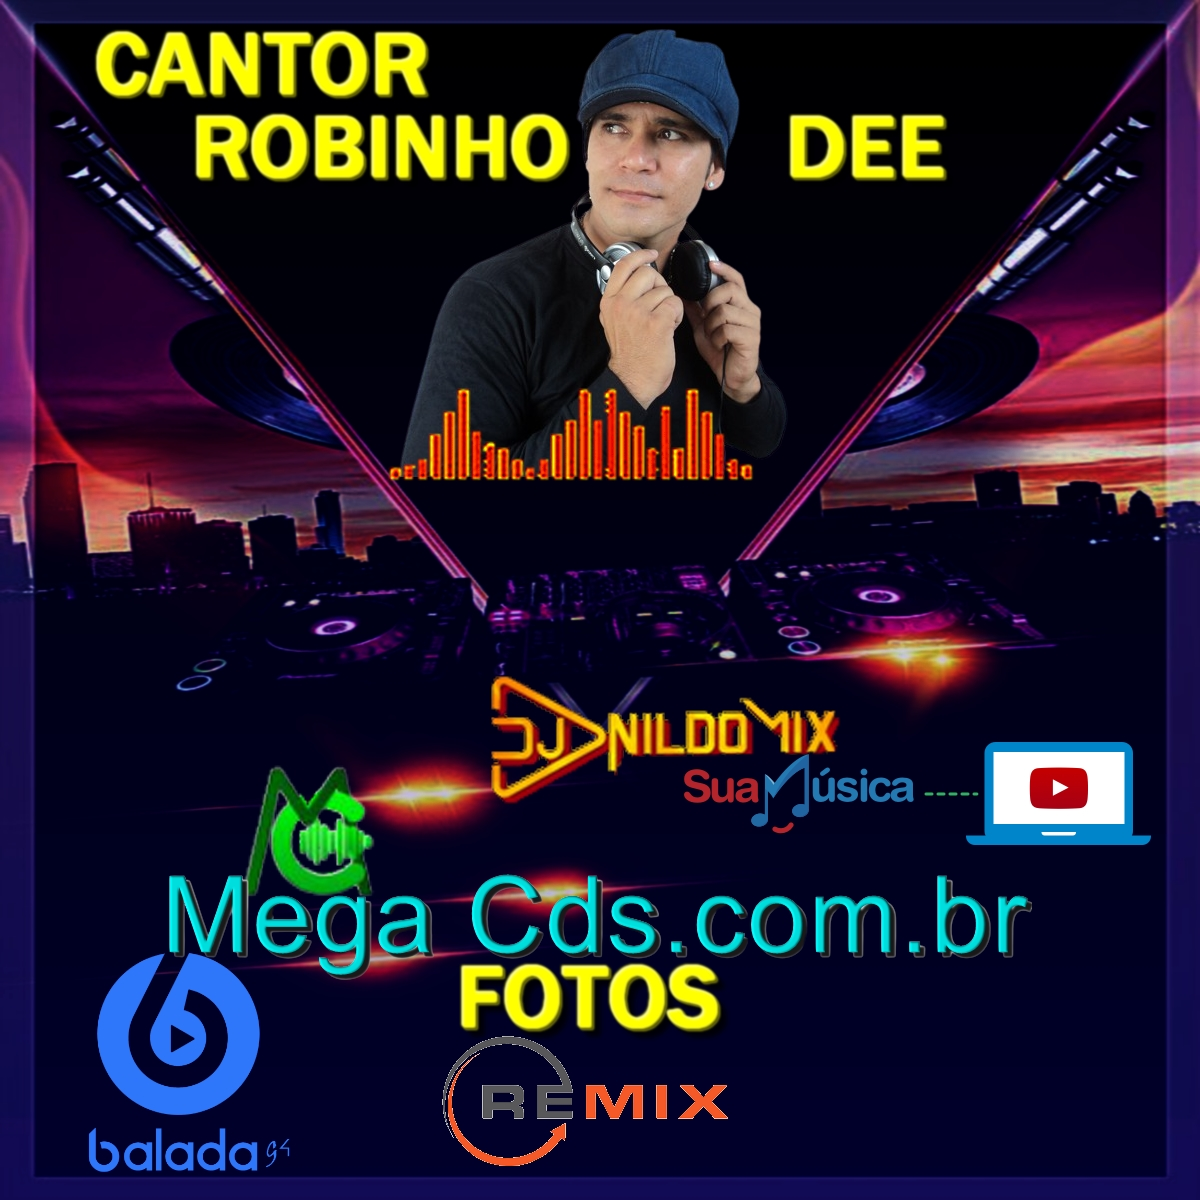 ROBINHO DEE DJ NILDO MIX FOTOS REMIX 2021